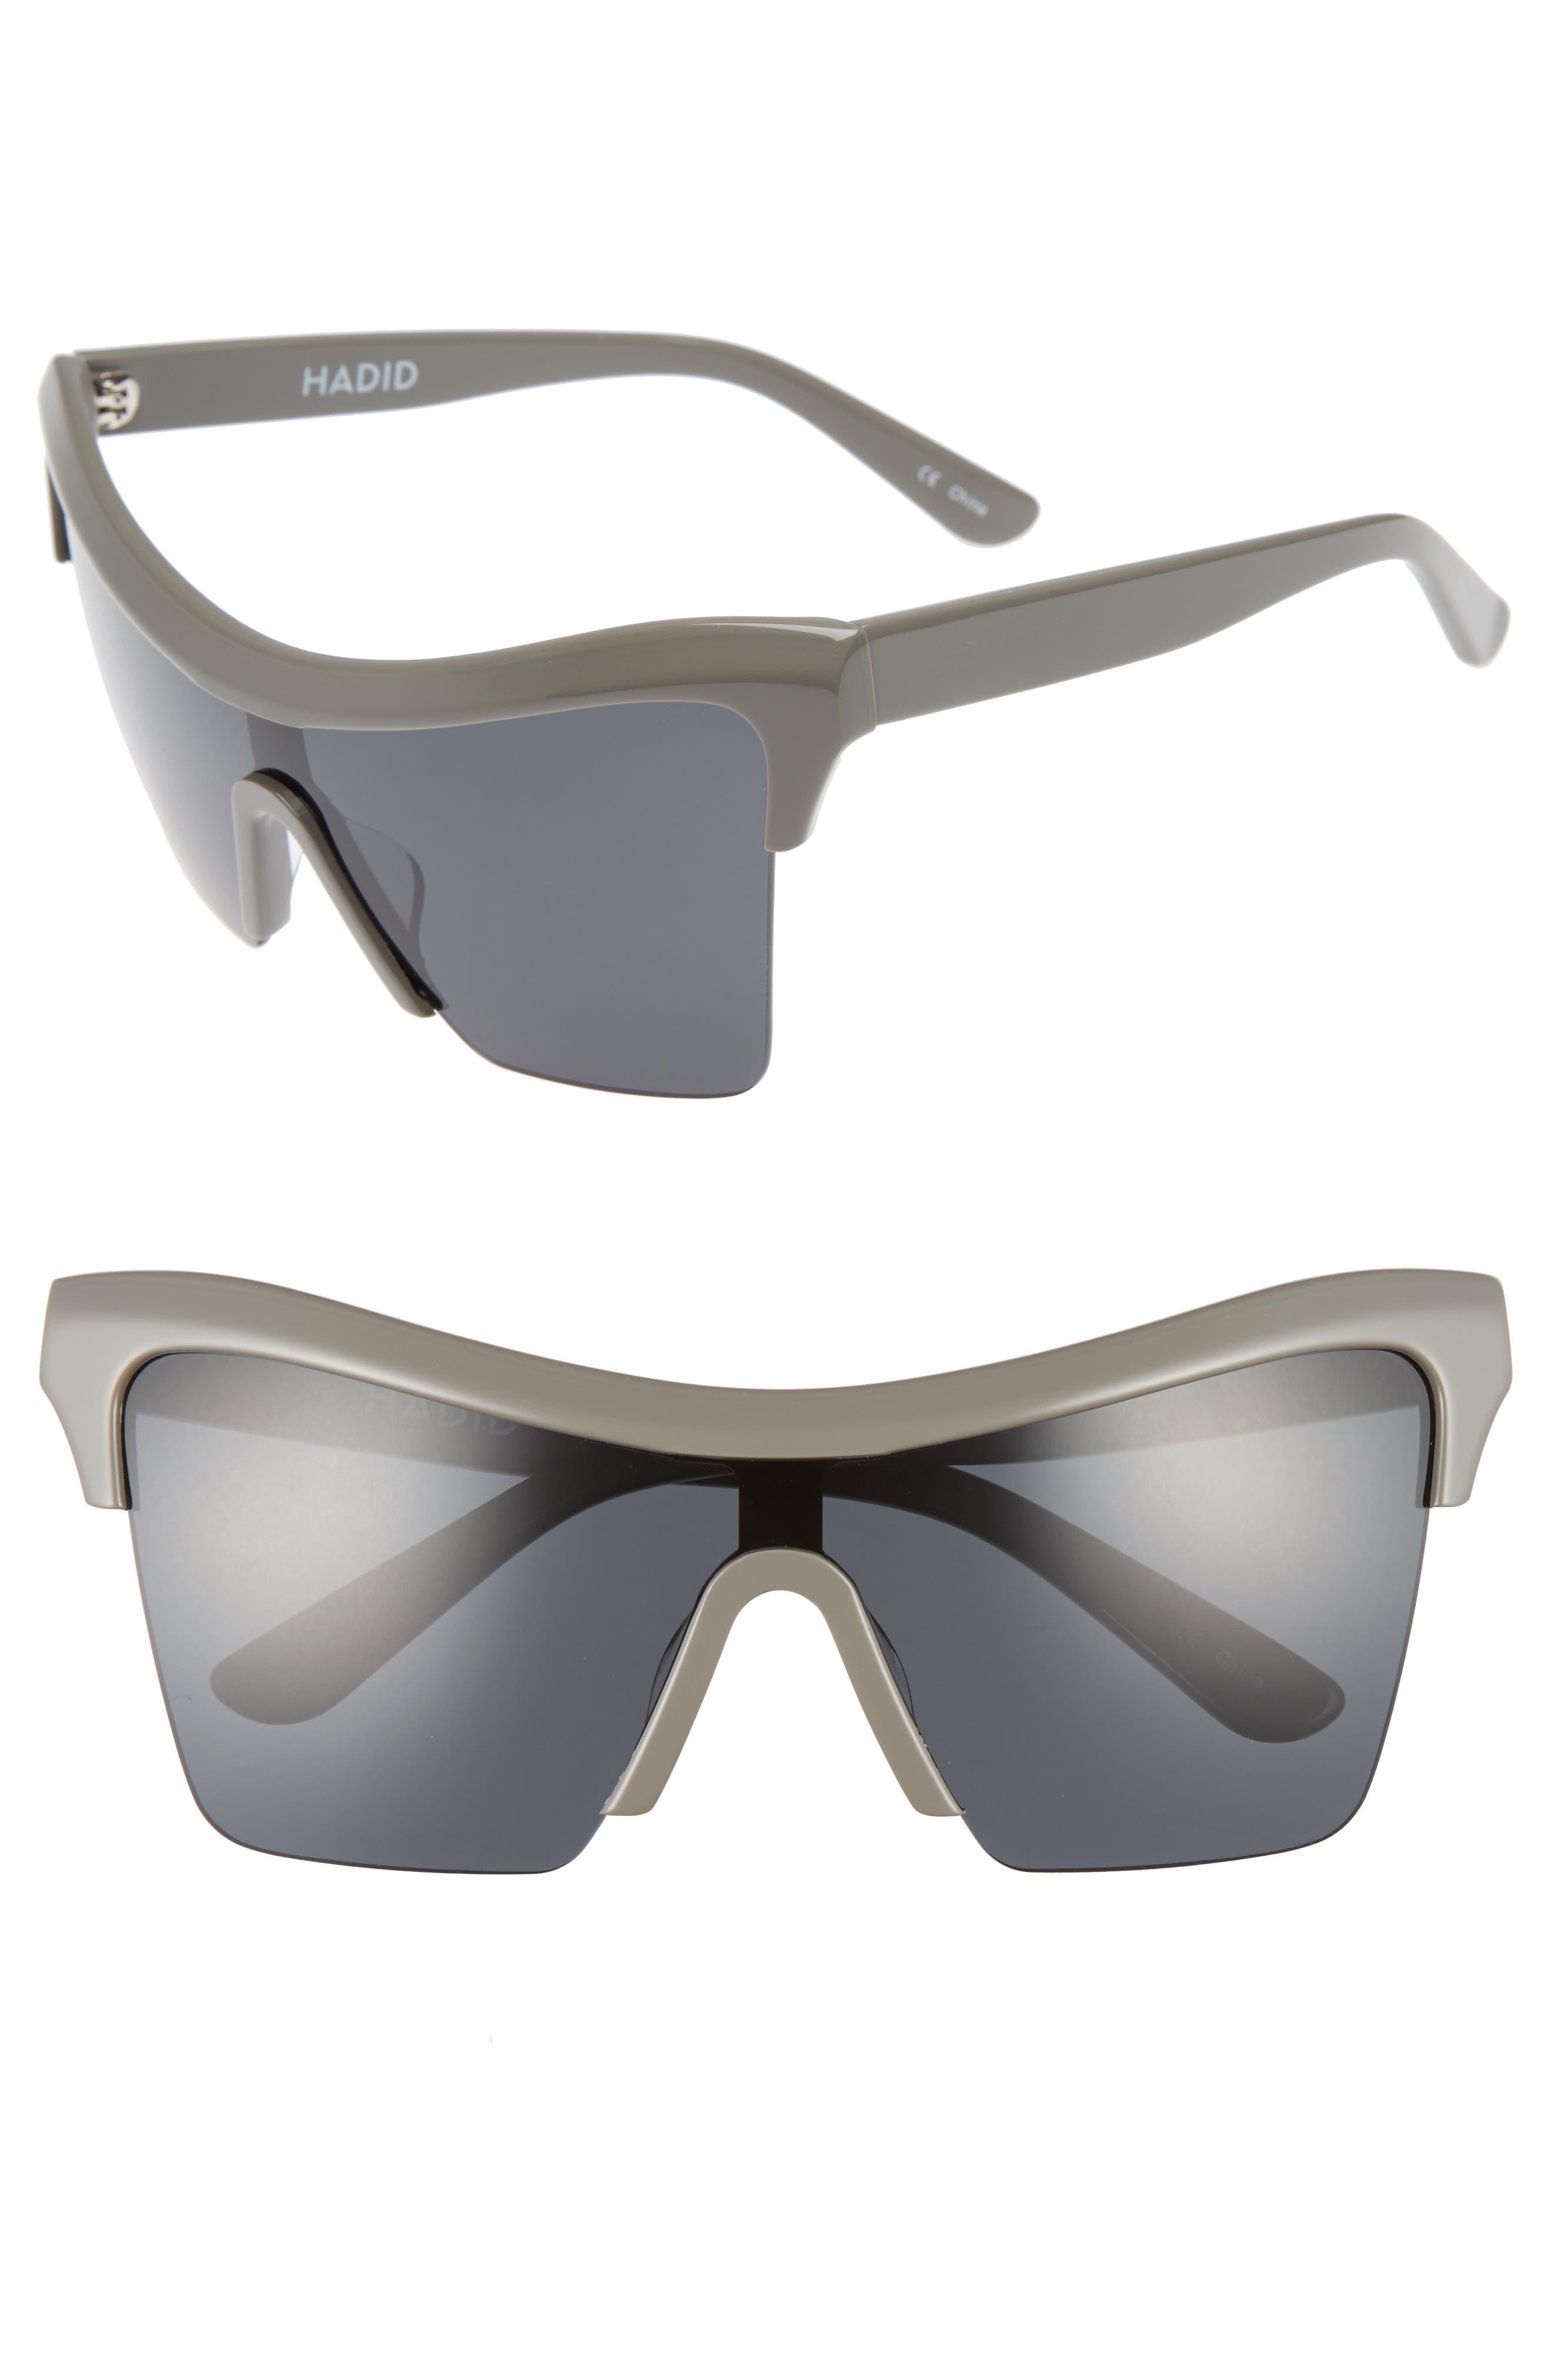 Passport Control 68mm Sunglasses,                             Main thumbnail 1, color,                             Grey